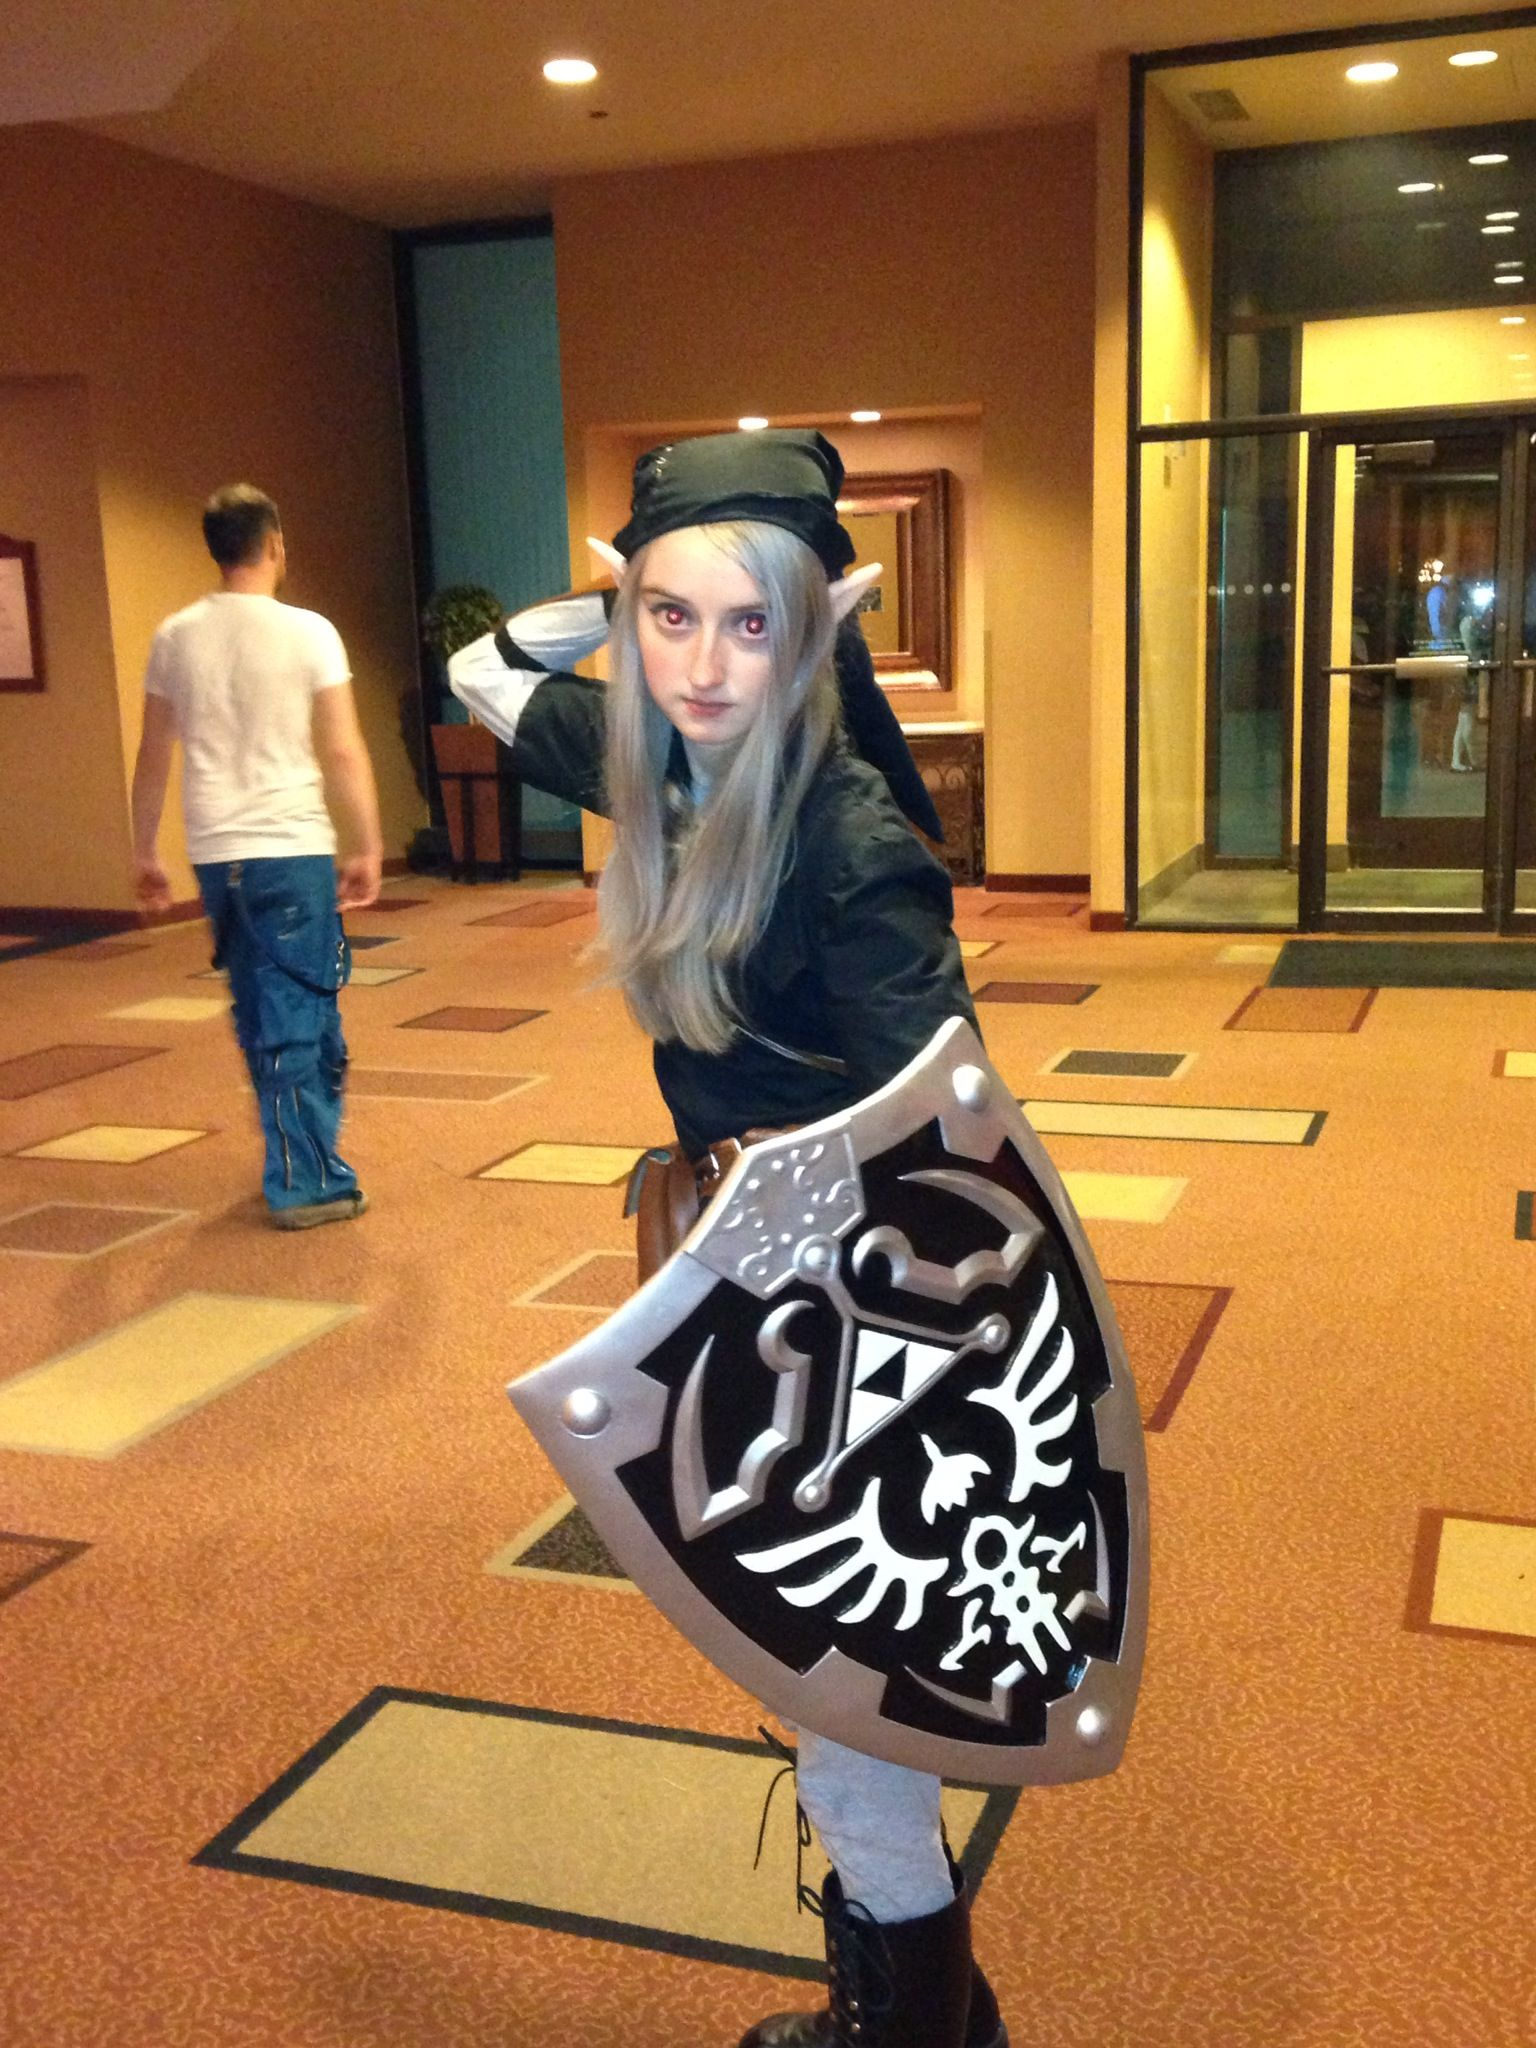 Link from Zelda at Metacon in Mpls 2013. Amazing costume!